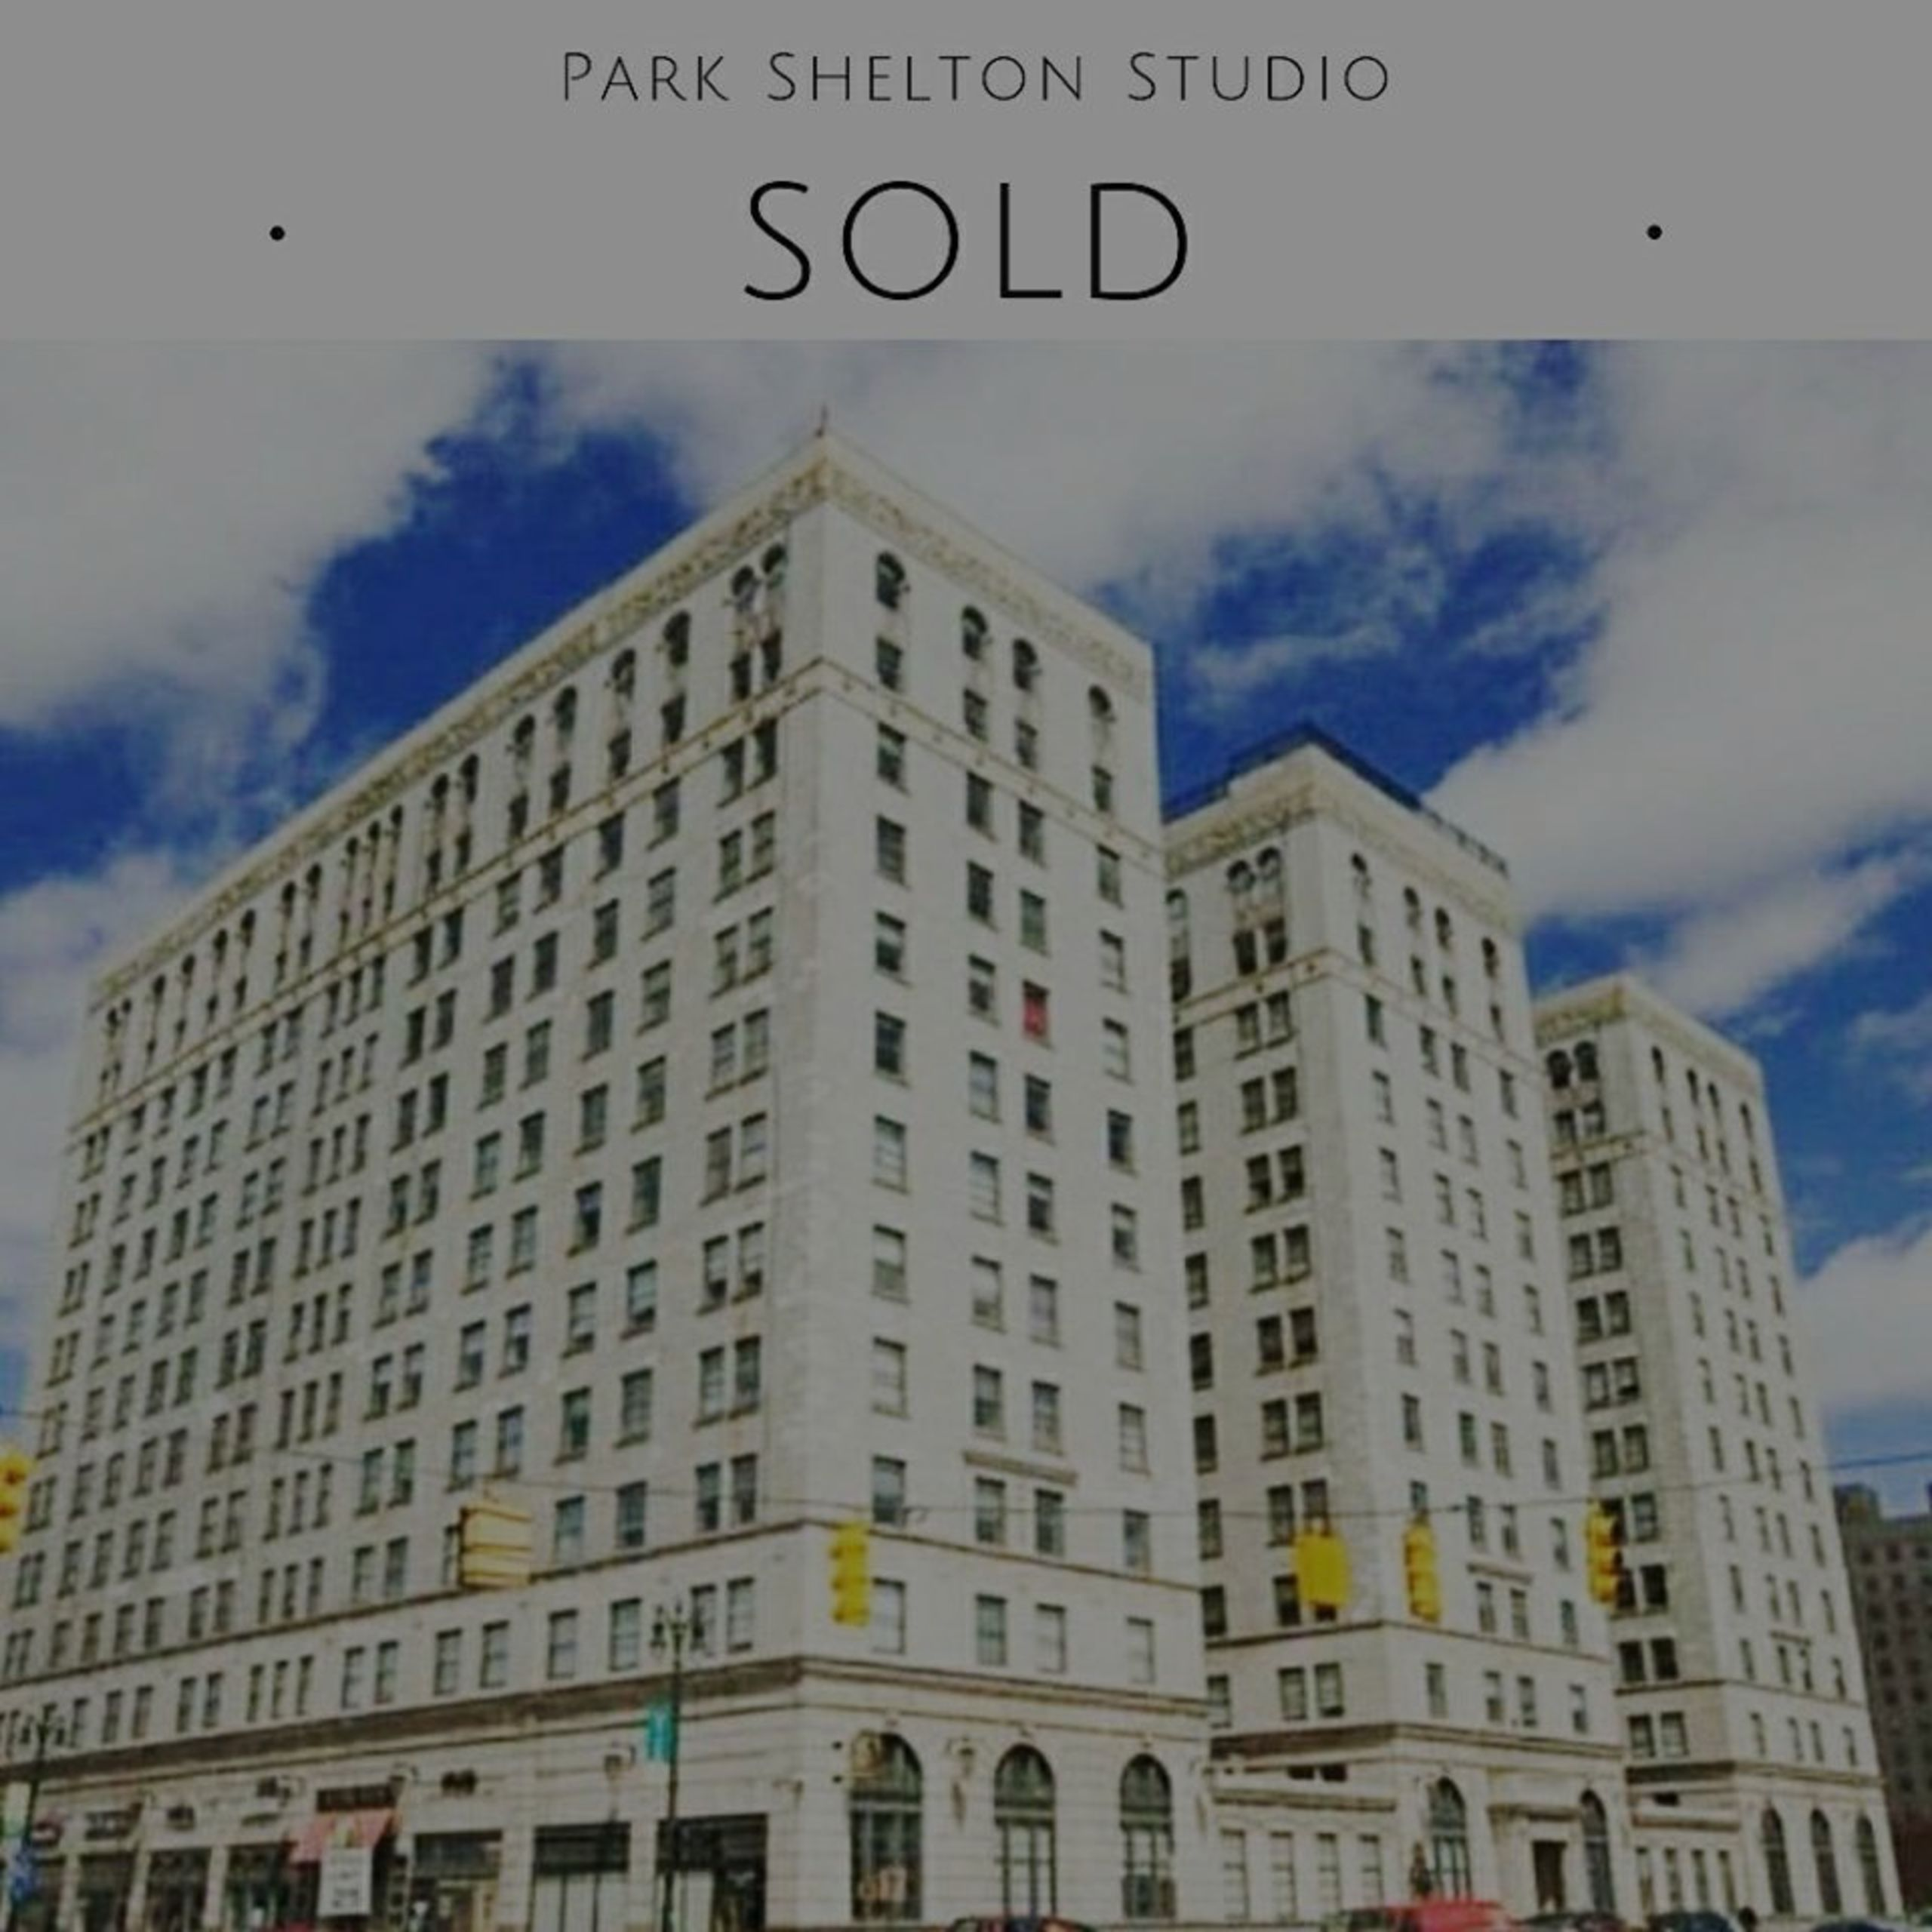 – SOLD – Gorgeous Detroit studio in the timeless Park Shelton building!